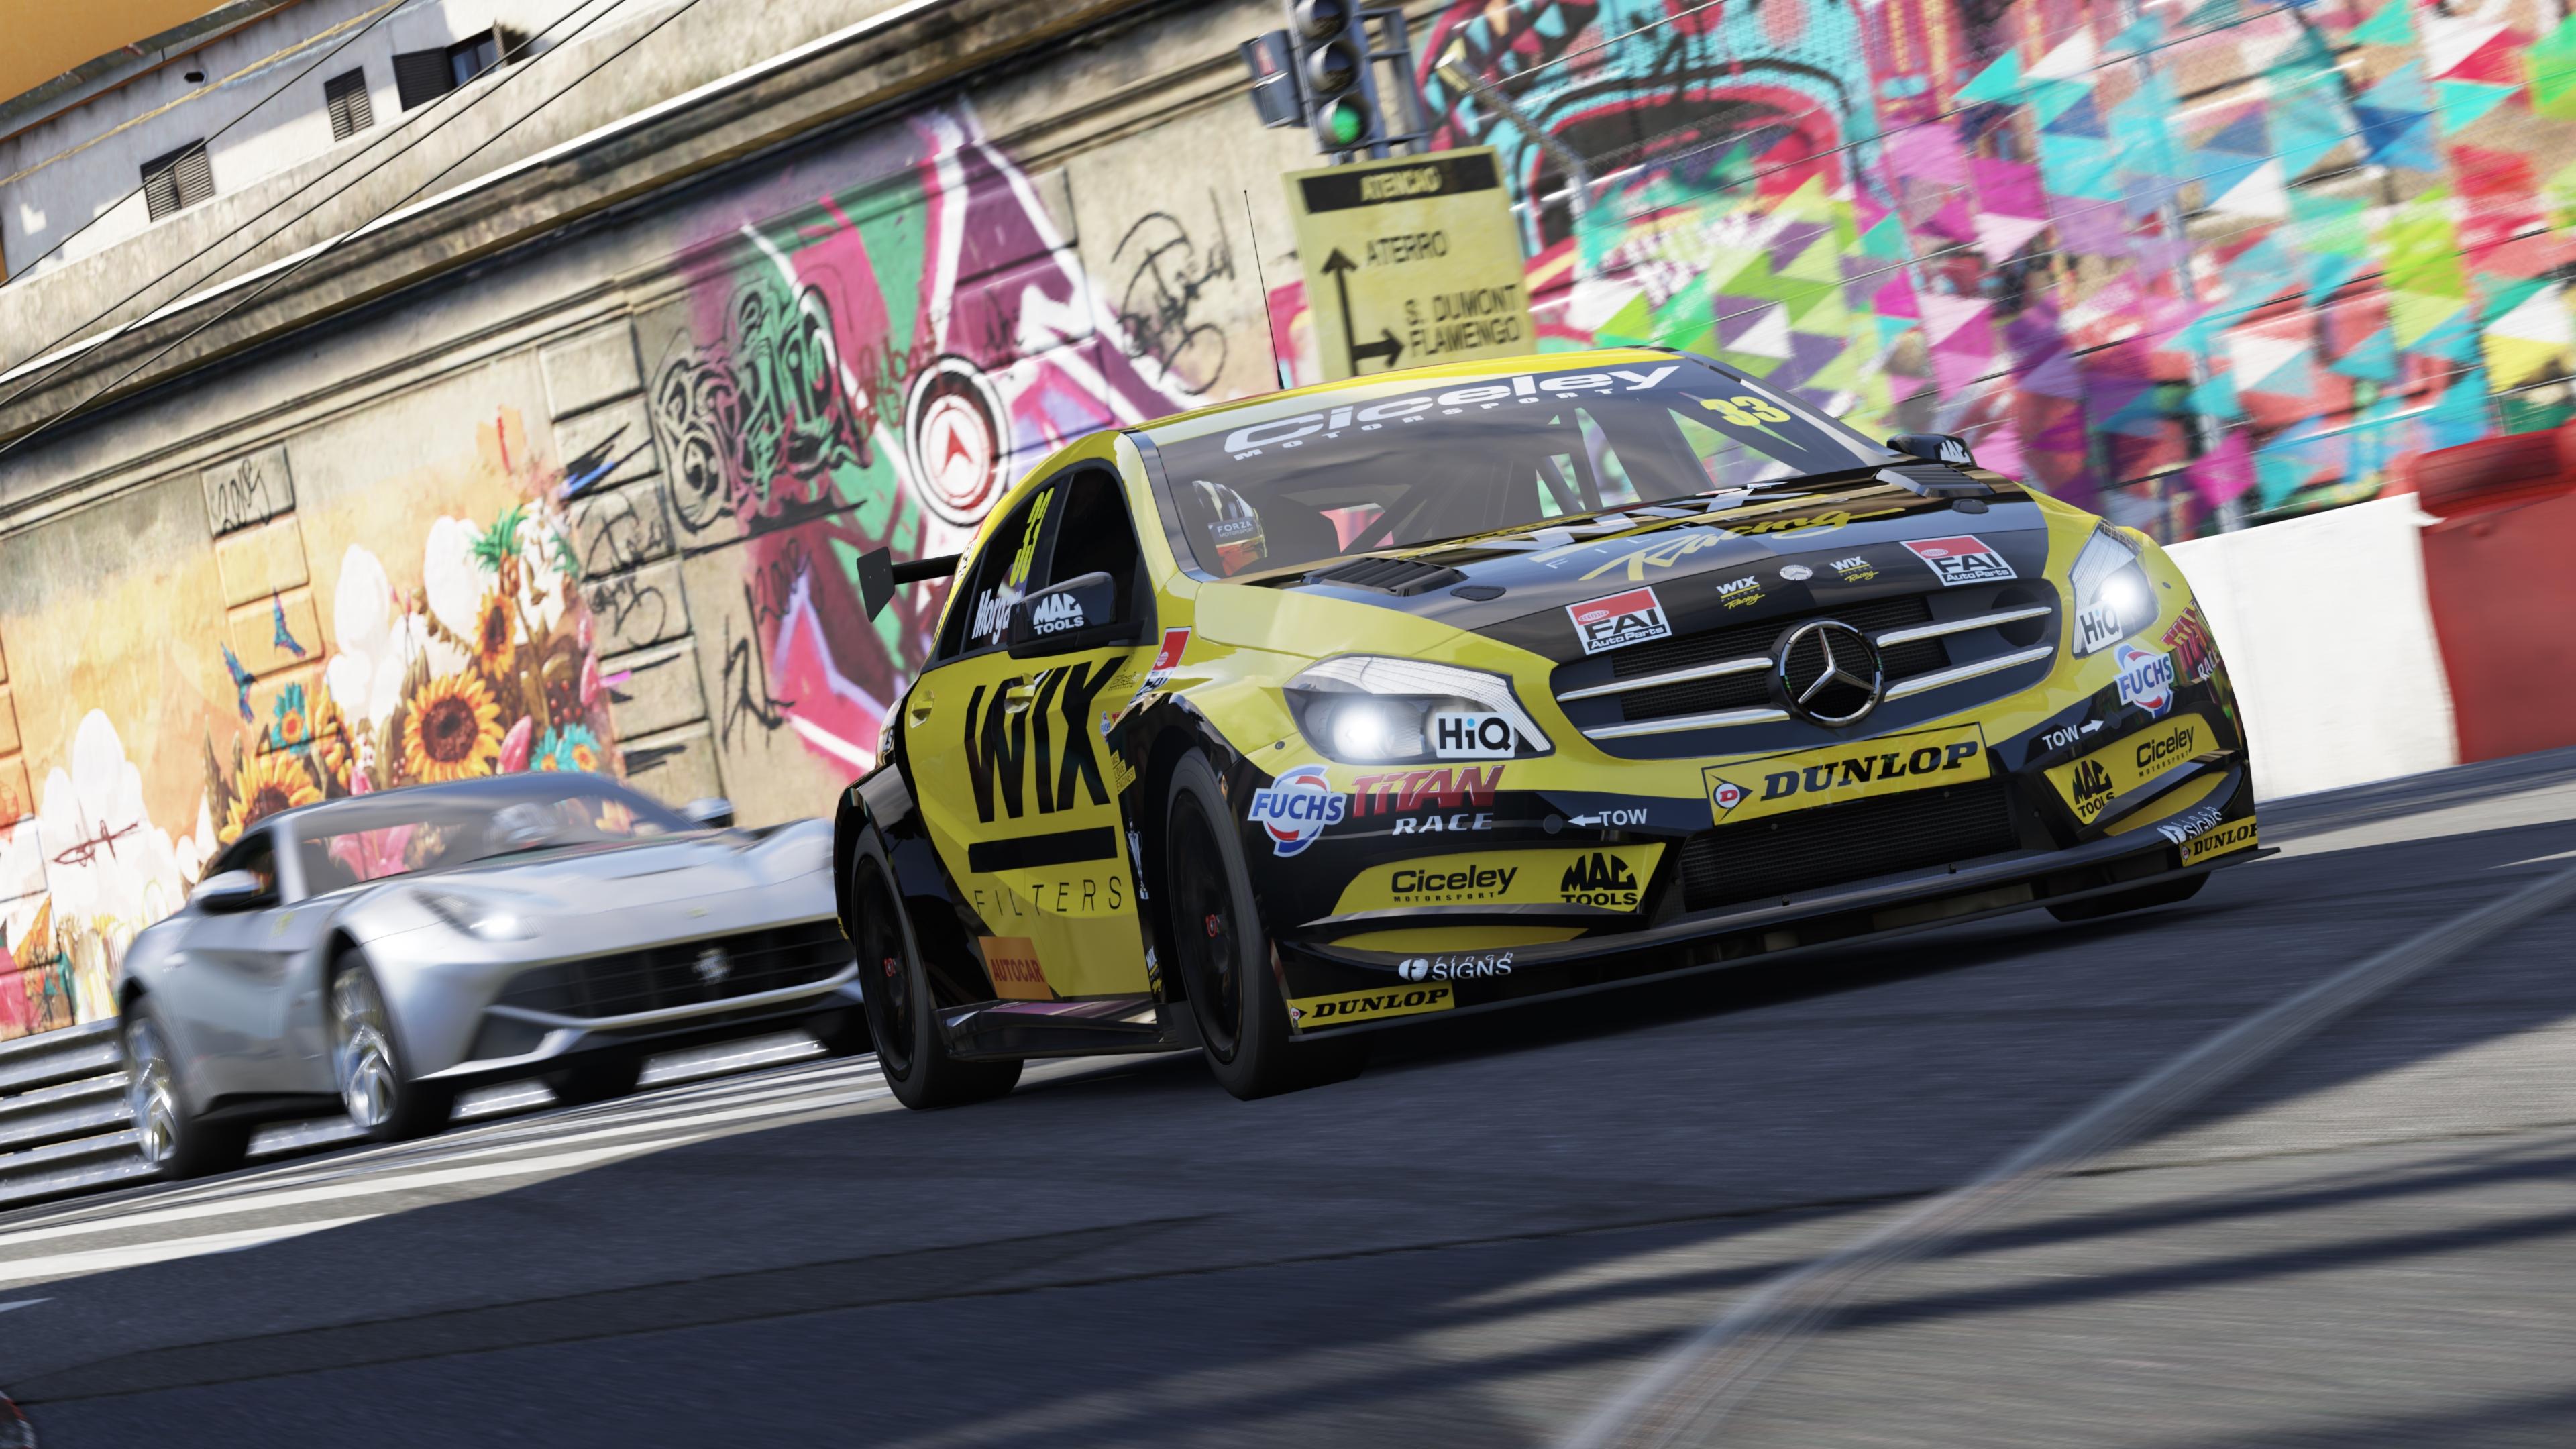 Forza Motorsport 6: Apex 4k Ultra HD Wallpaper